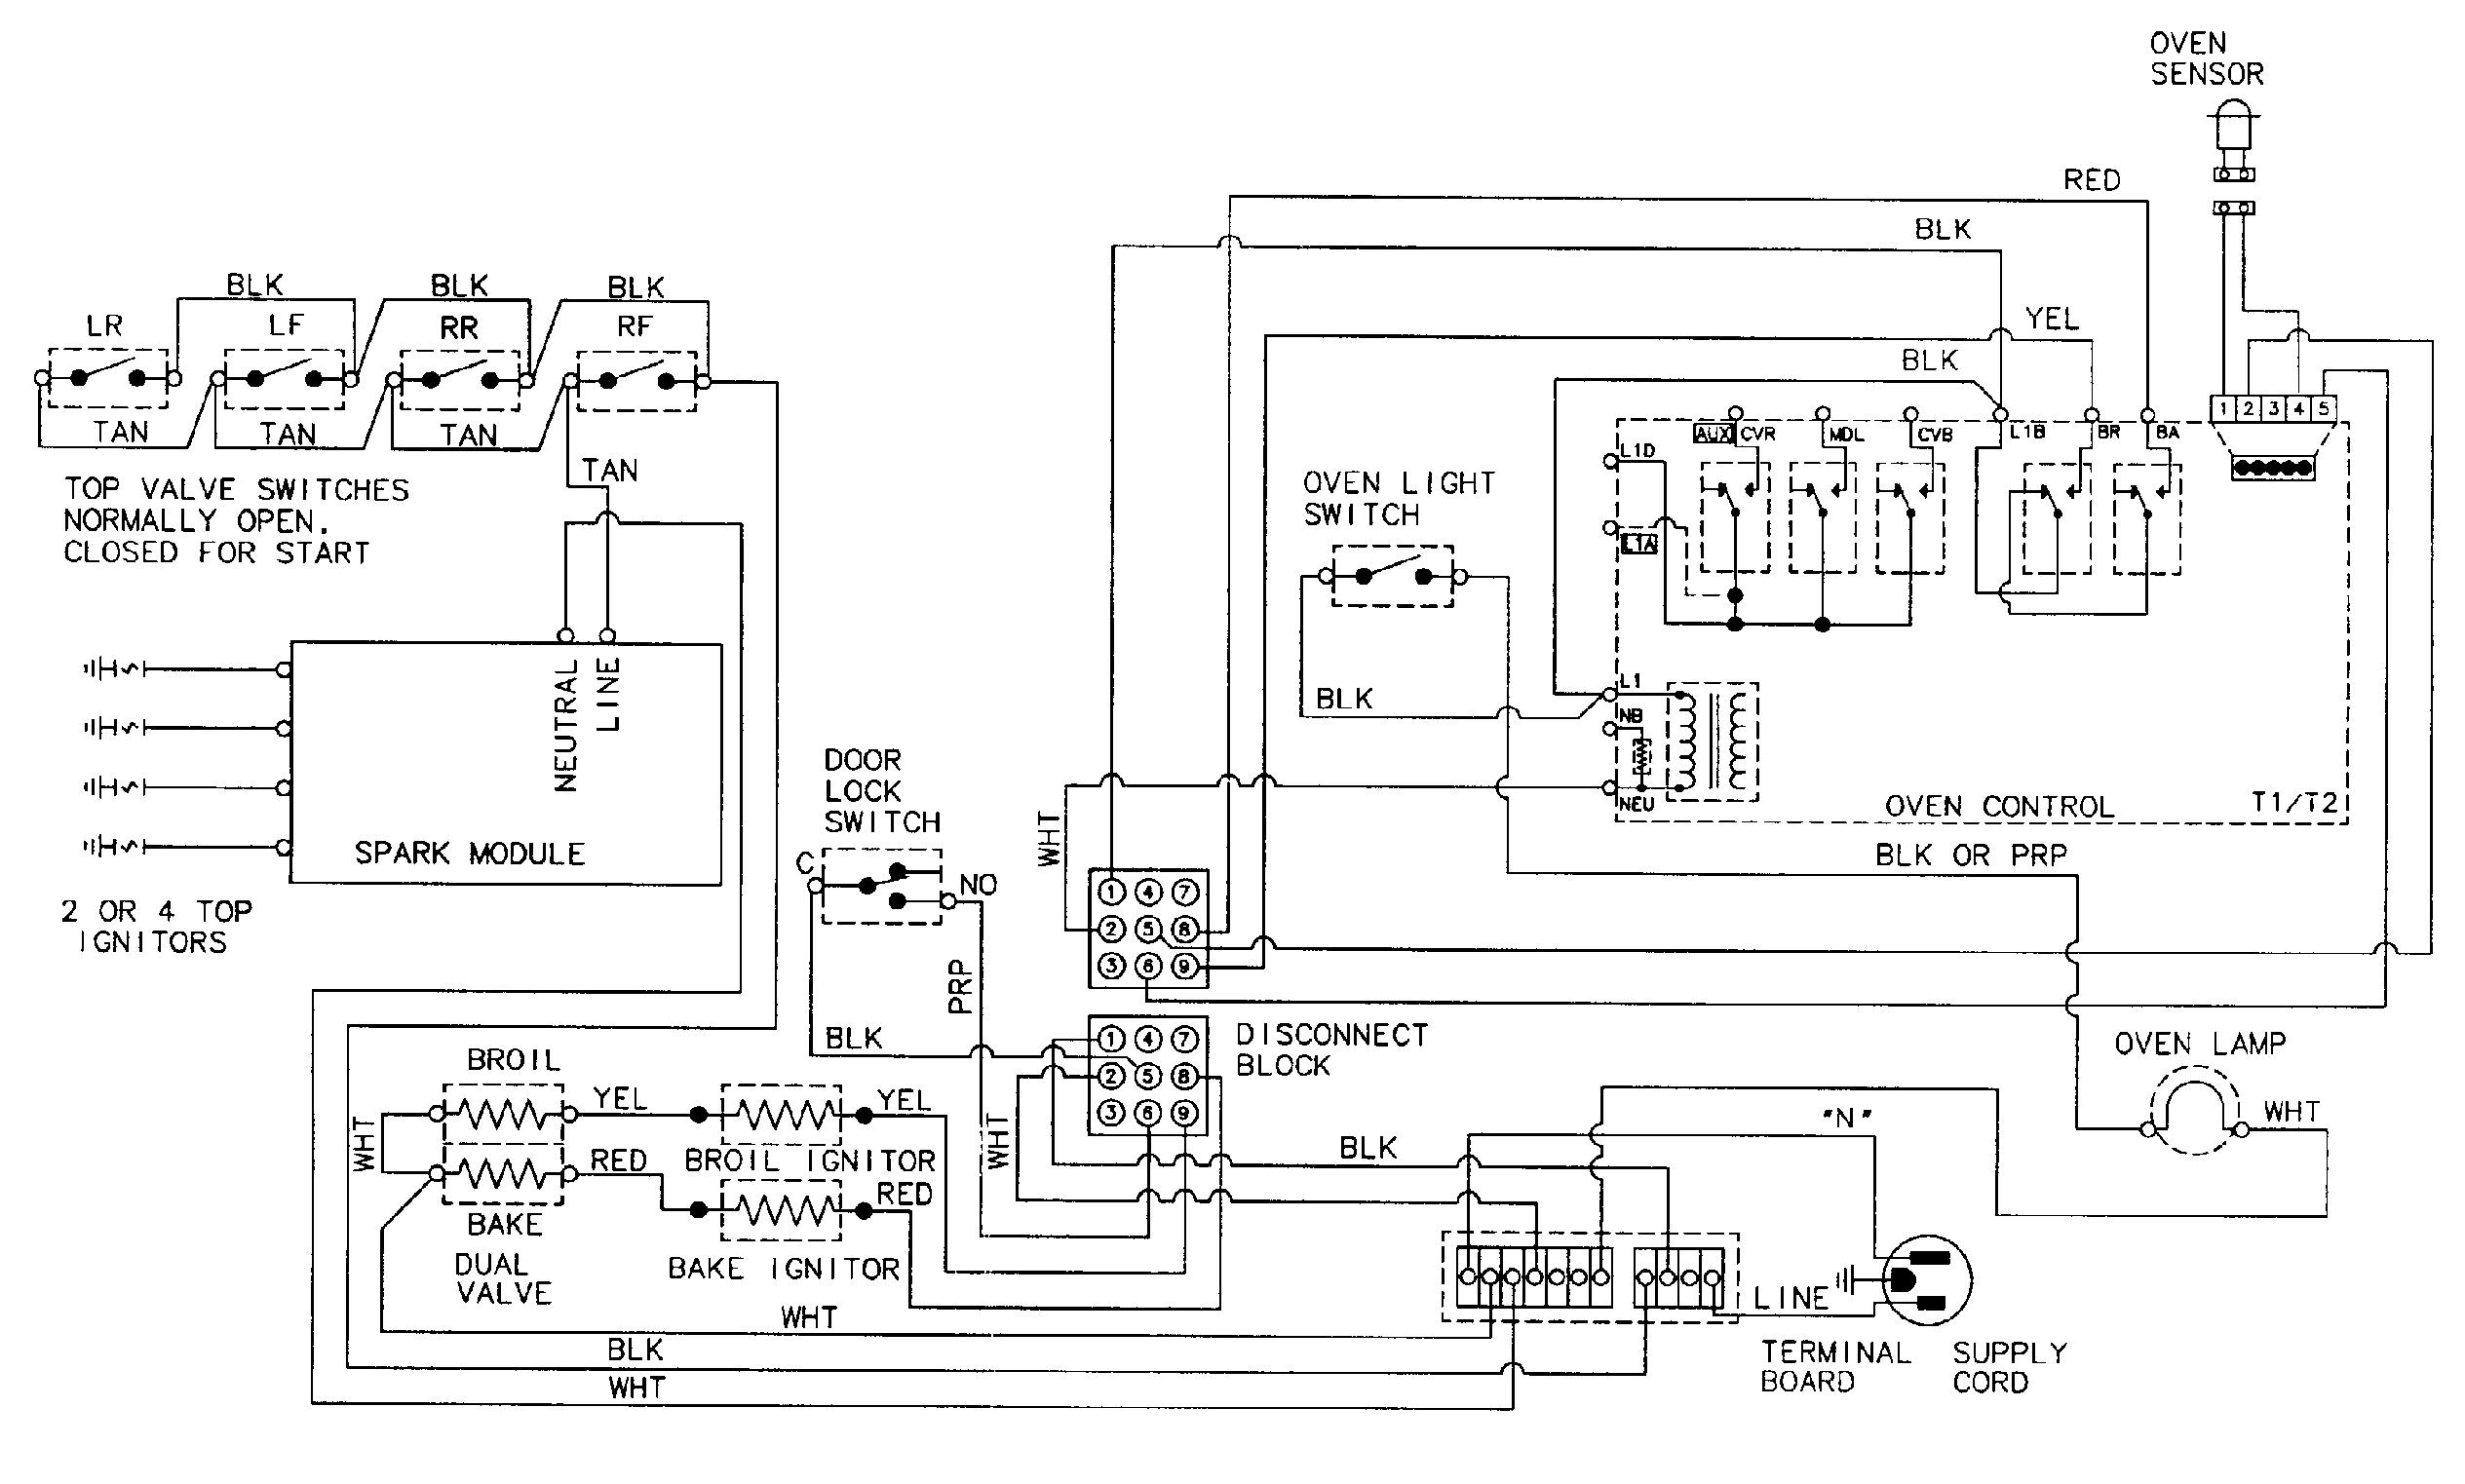 Magic Chef Stove Wiring Diagram   Fusebox and Wiring Diagram ...